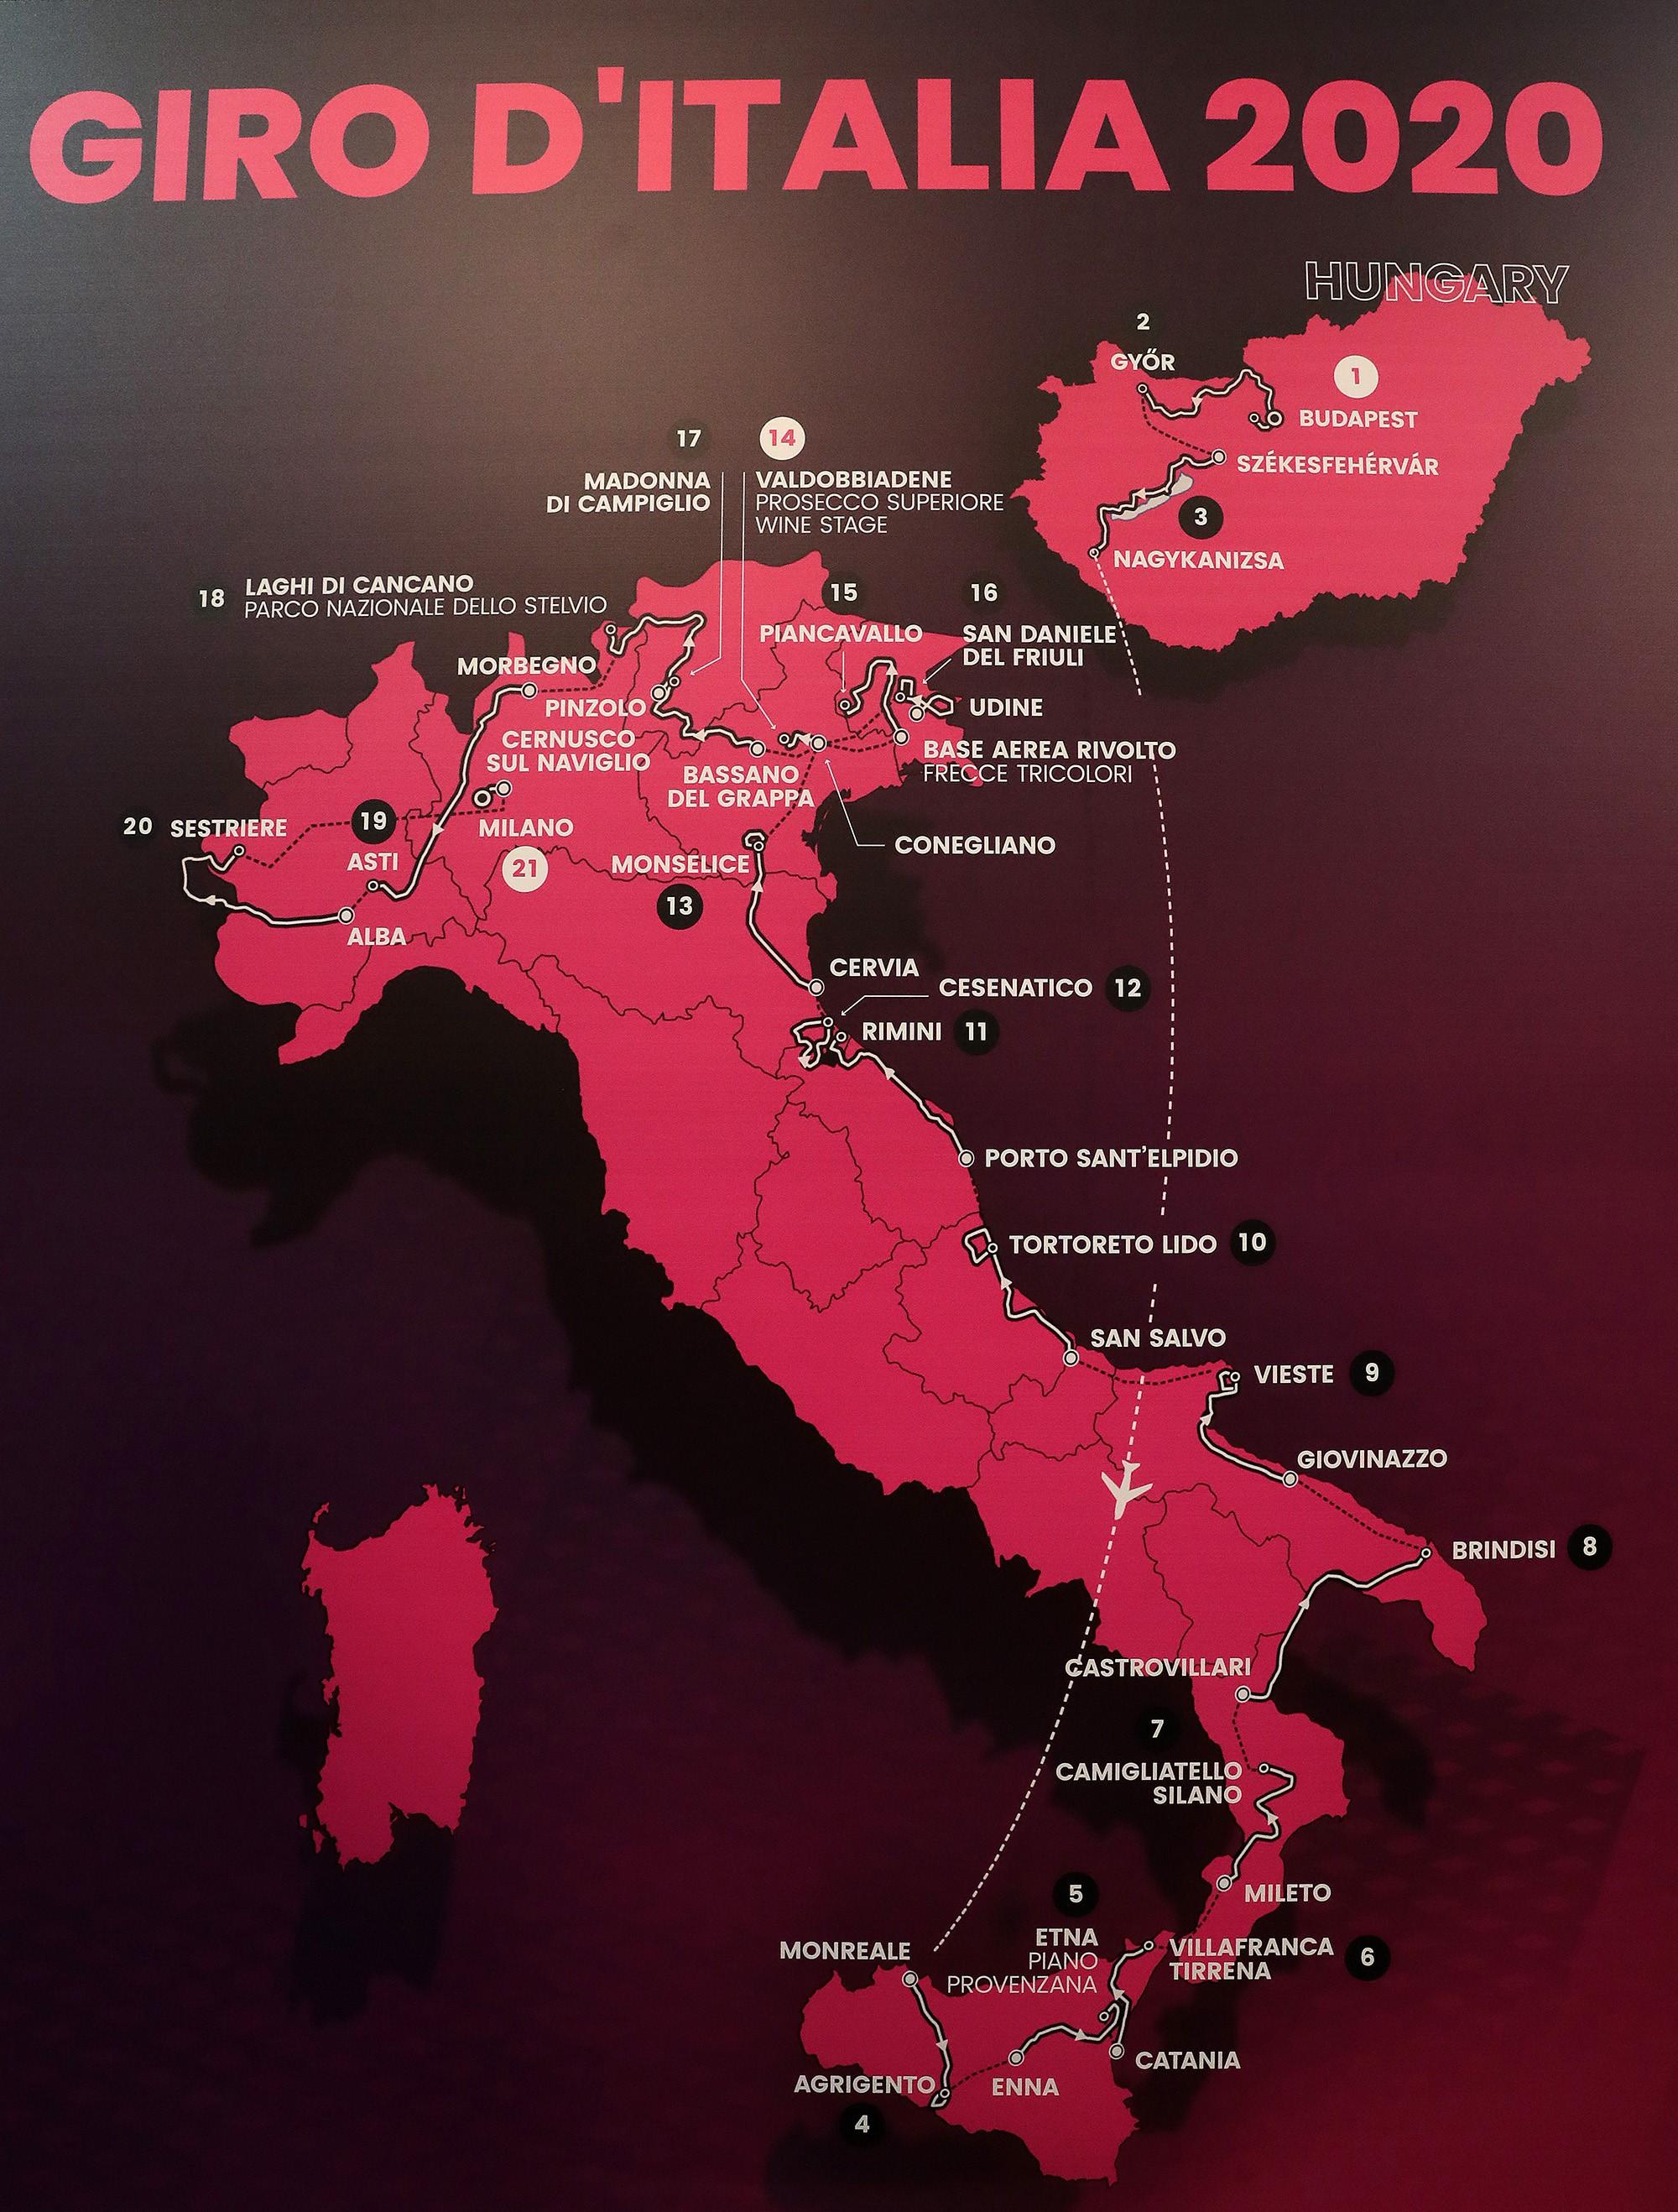 Giro 2020 - The original route